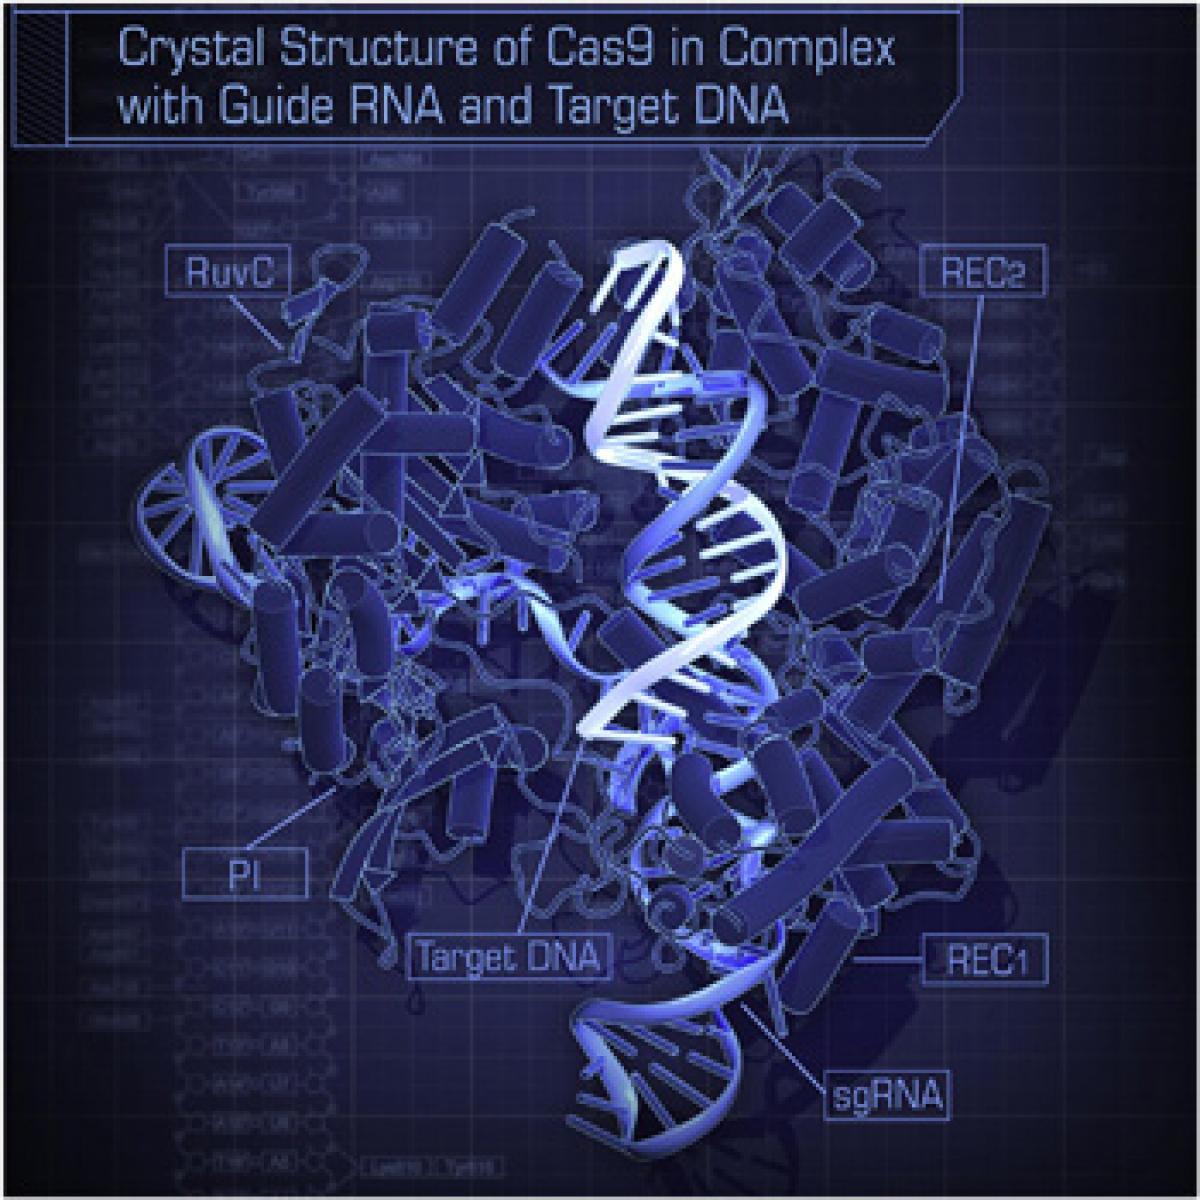 CRISPR: Good science or evil science?